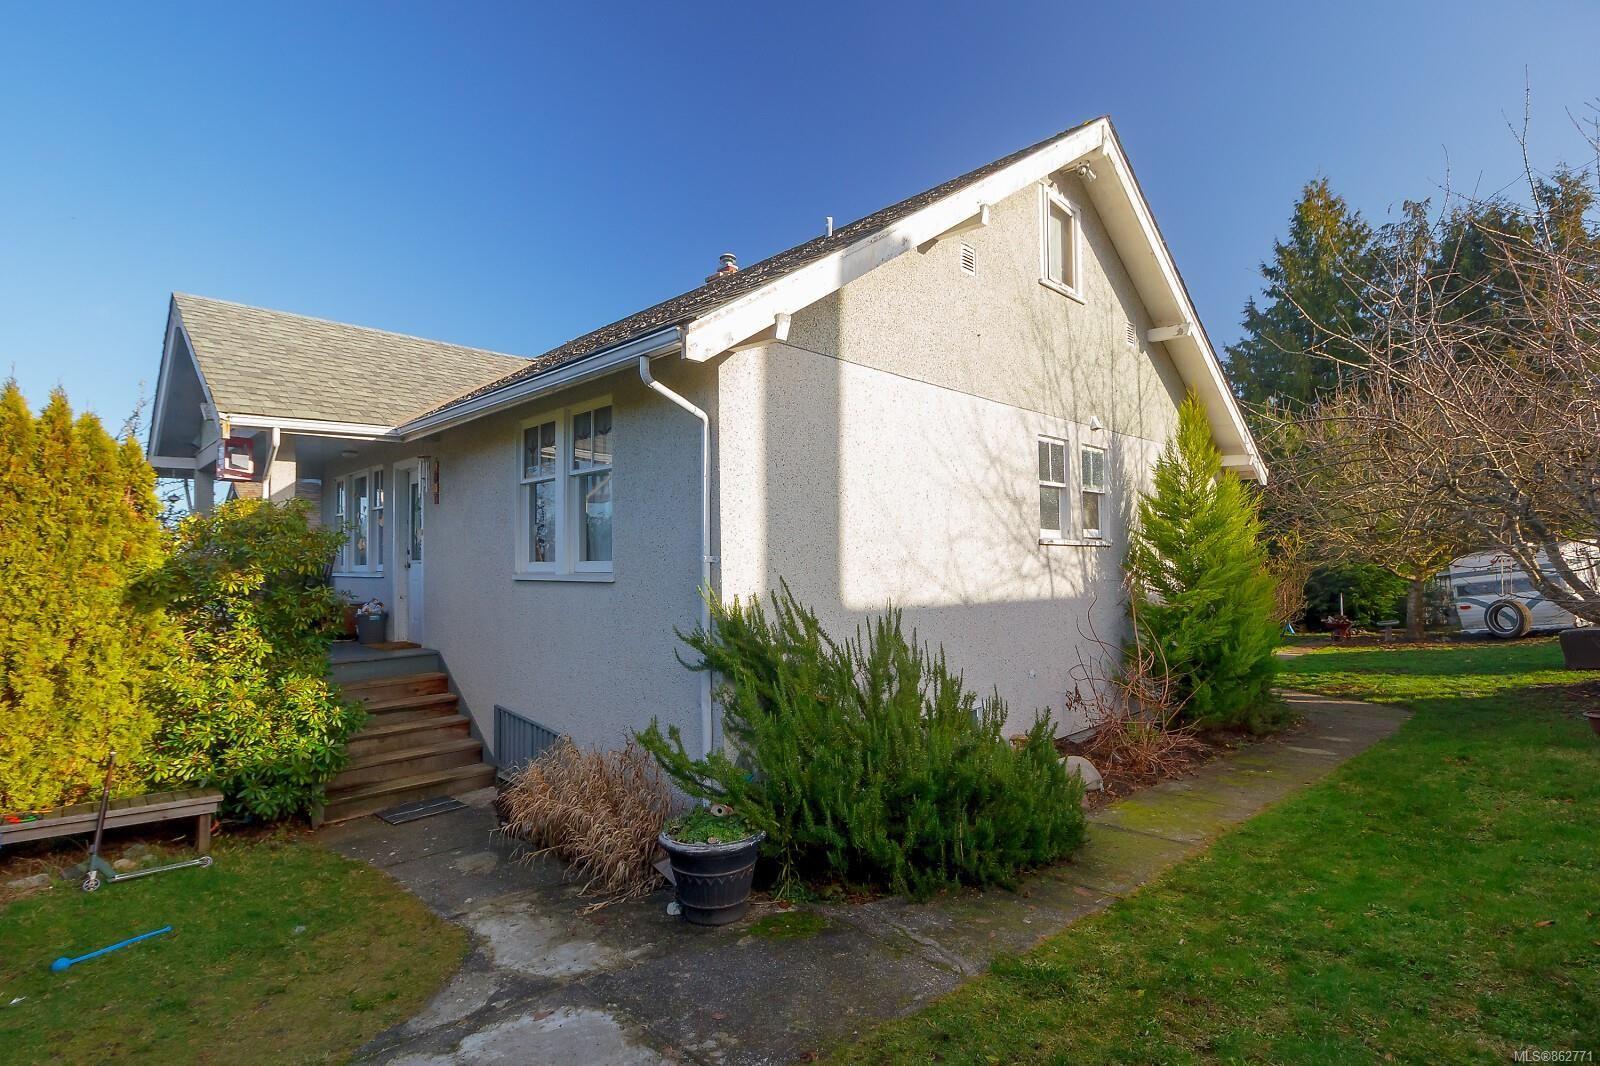 Main Photo: 317 Buller St in : Du Ladysmith House for sale (Duncan)  : MLS®# 862771